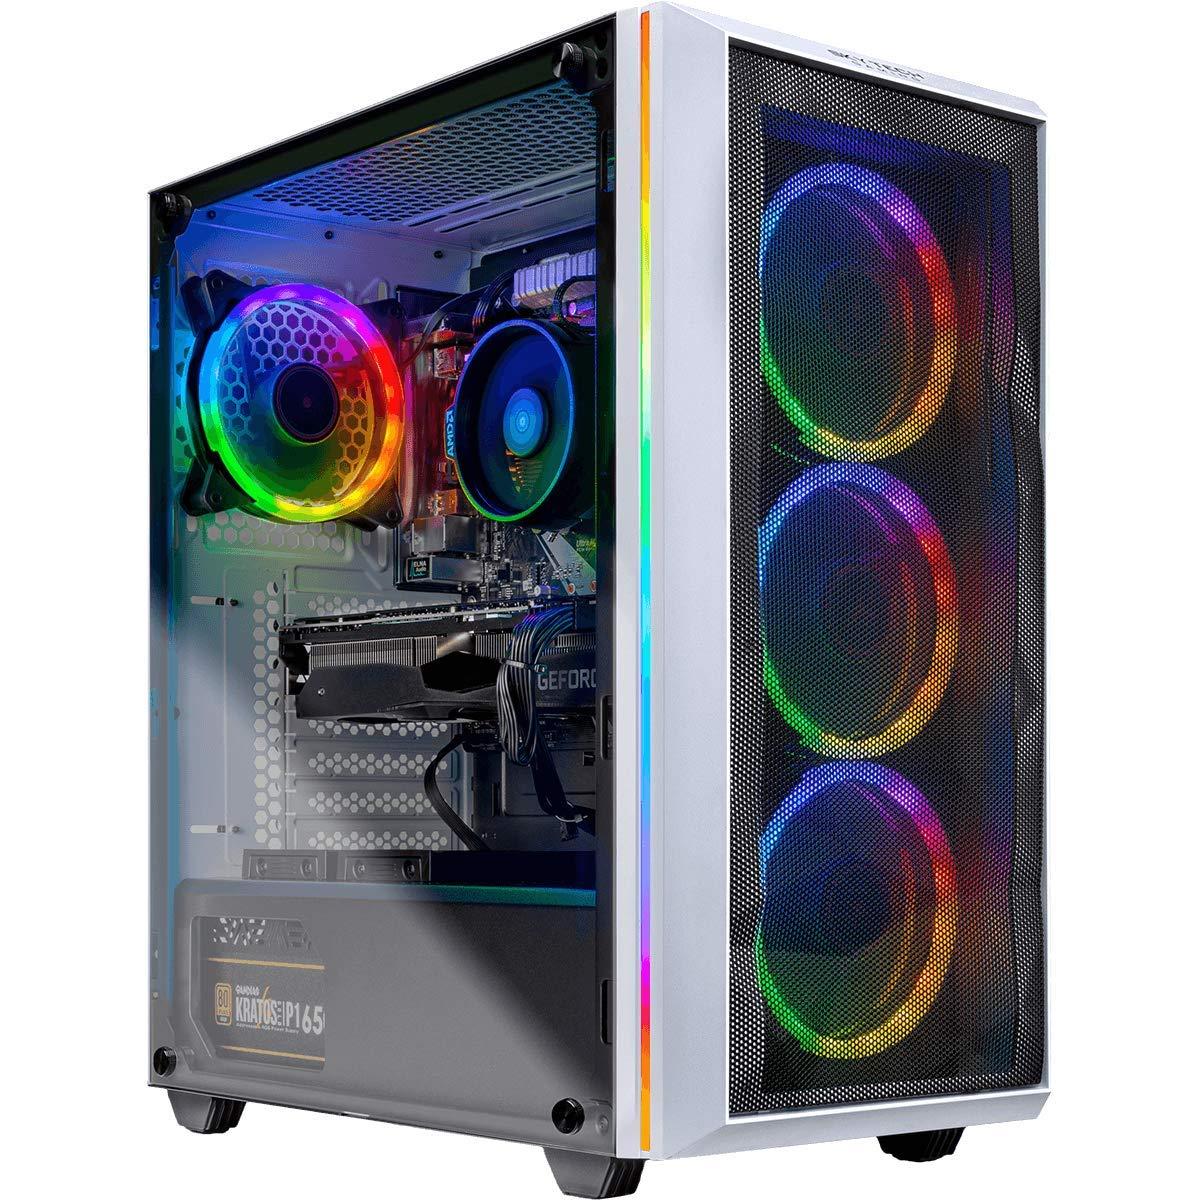 Skytech Chronos Gaming PC Desktop - AMD Ryzen 7 3700X, NVIDIA RTX 2070 Super 8GB, 16GB DDR4 (2X 8GB), 1TB SSD, B450 Motherboard, 650 Watt Gold